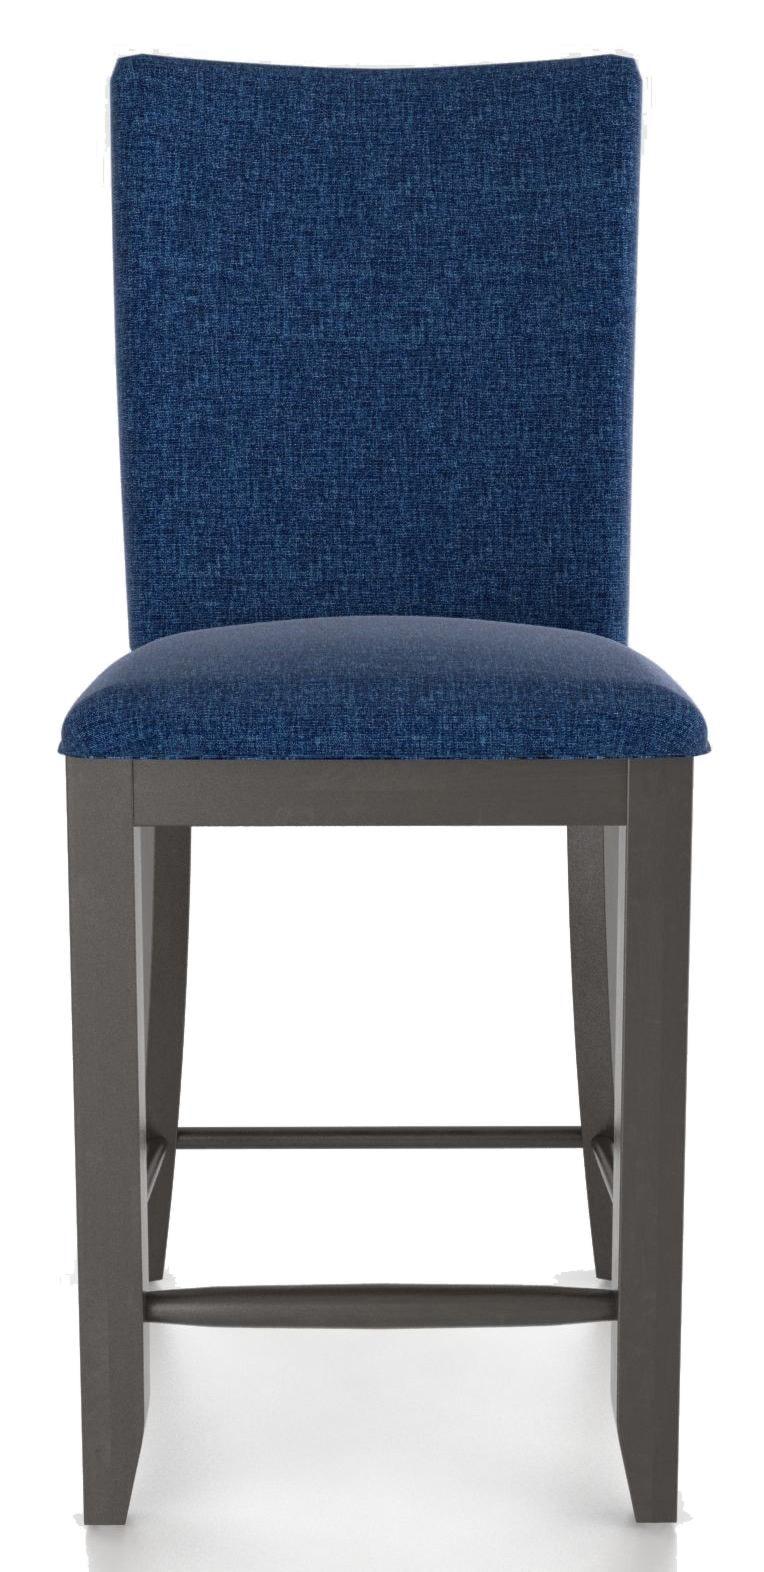 Canadel Bar Stools Customizable 24quot Upholstered Fixed  : bar20stools20stosto01259tk59melf b0jpgscalebothampwidth500ampheight500ampfsharpen25ampdown from www.beckerfurnitureworld.com size 500 x 500 jpeg 22kB